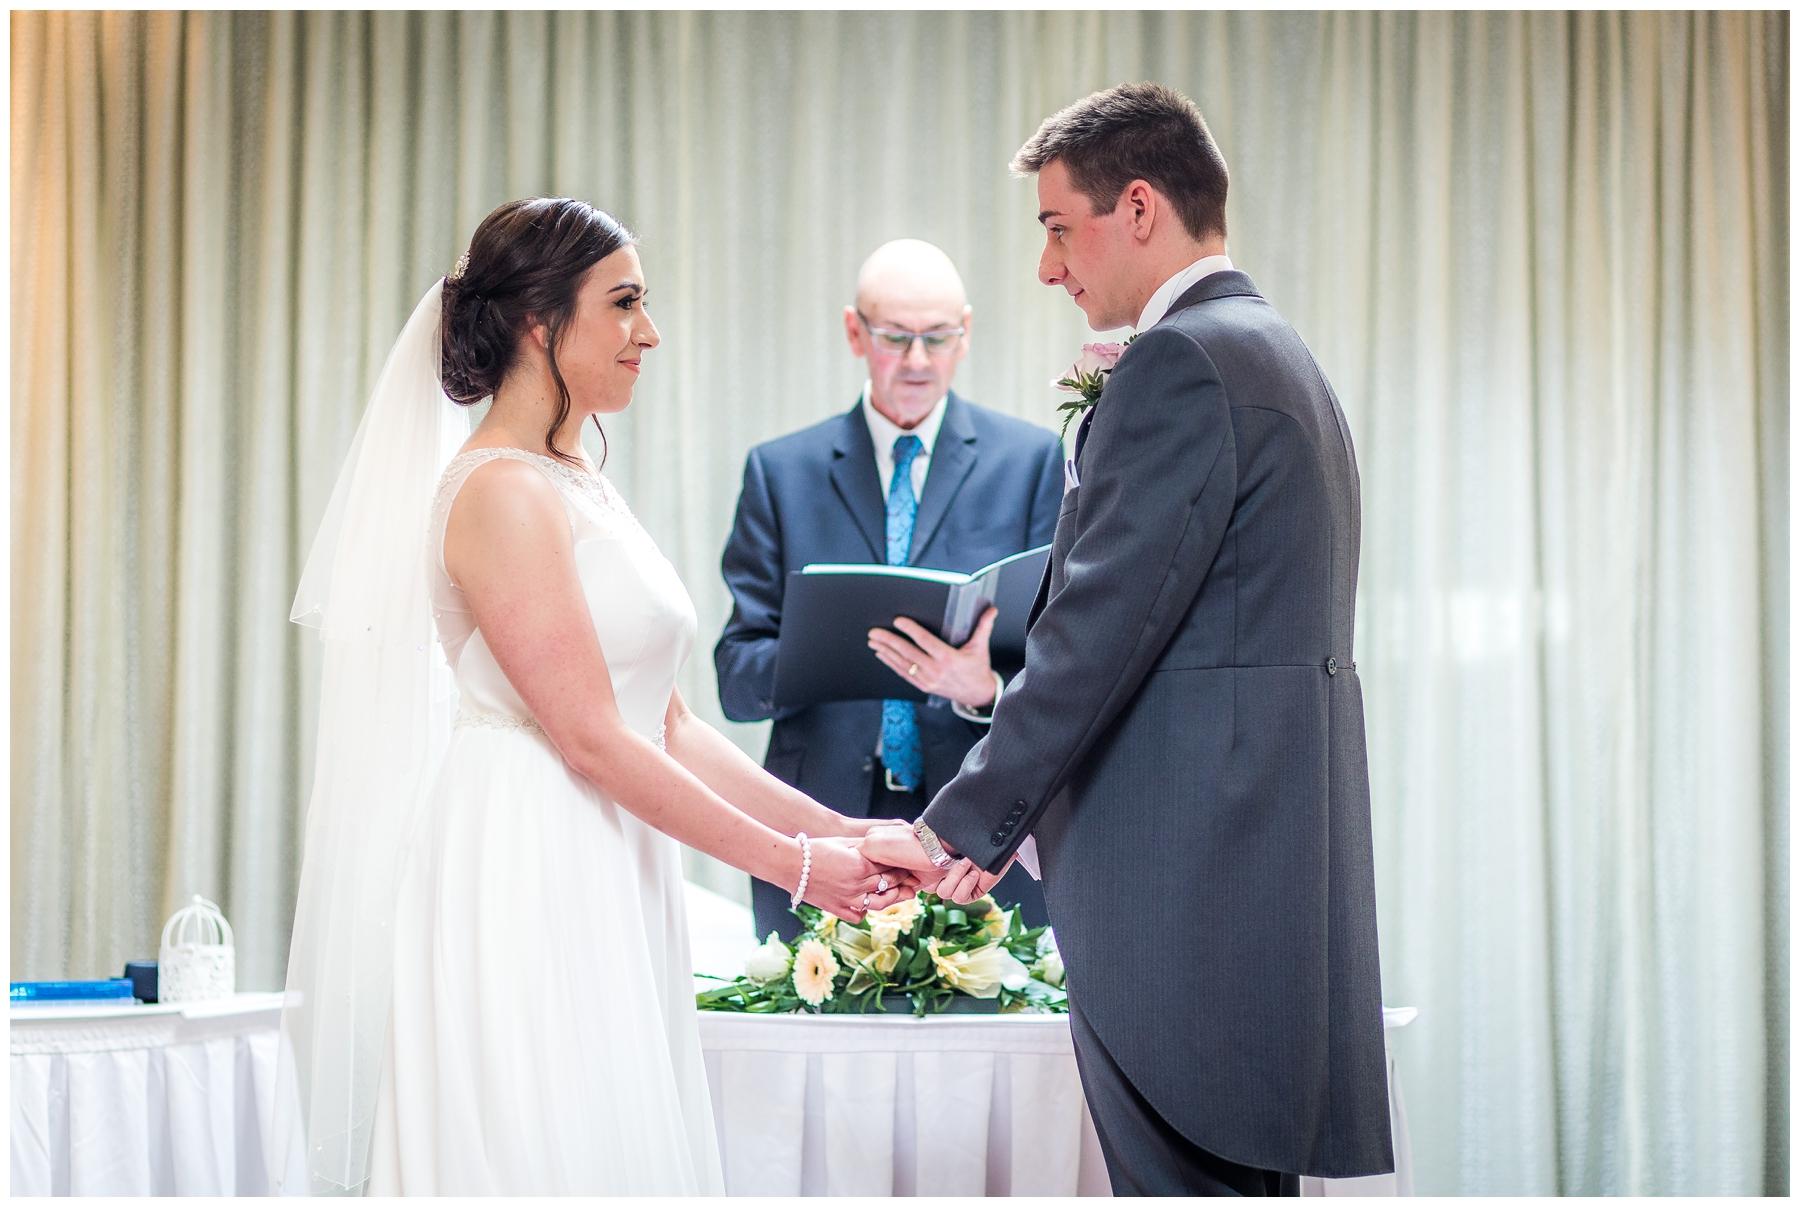 holland-hall-wedding-photography-becky-jason_0018.jpg